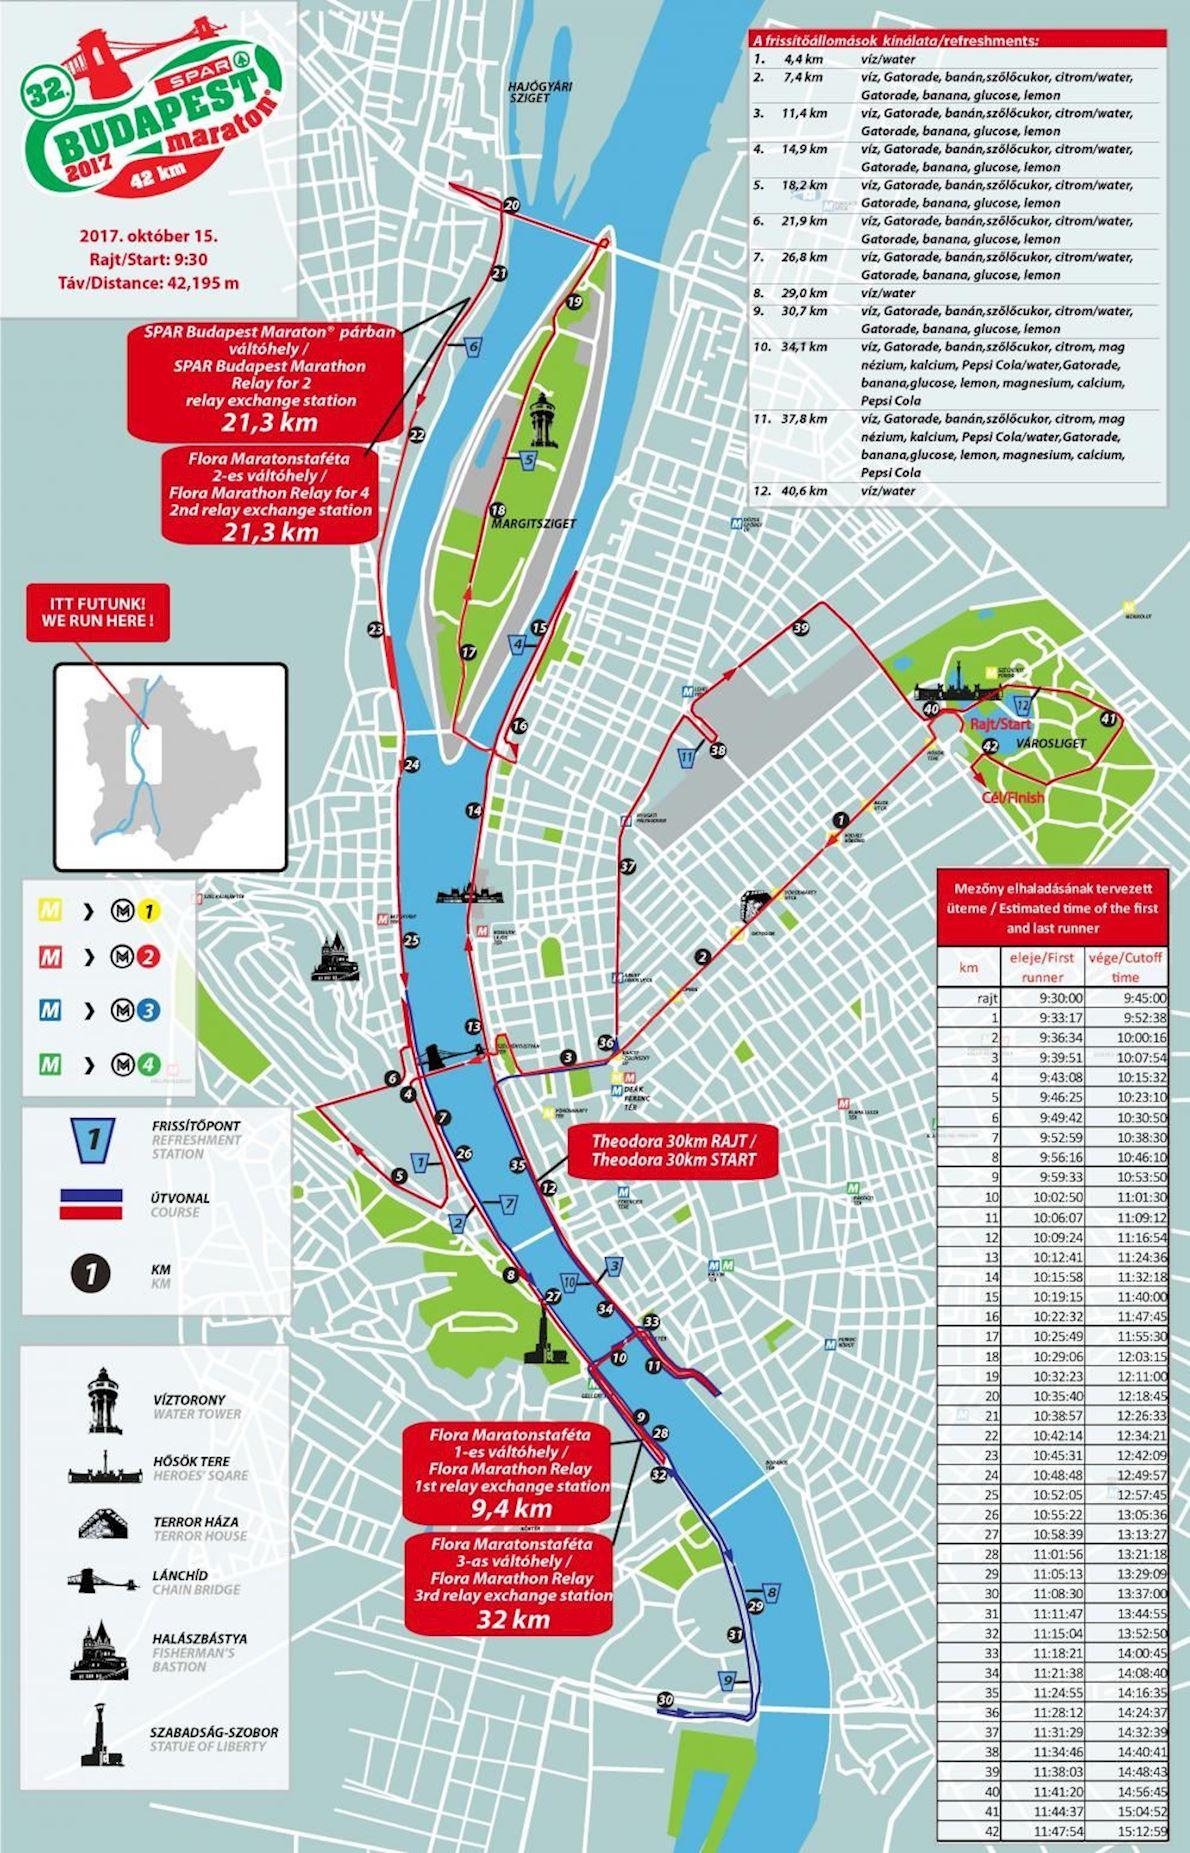 Spar Budapest Marathon 路线图